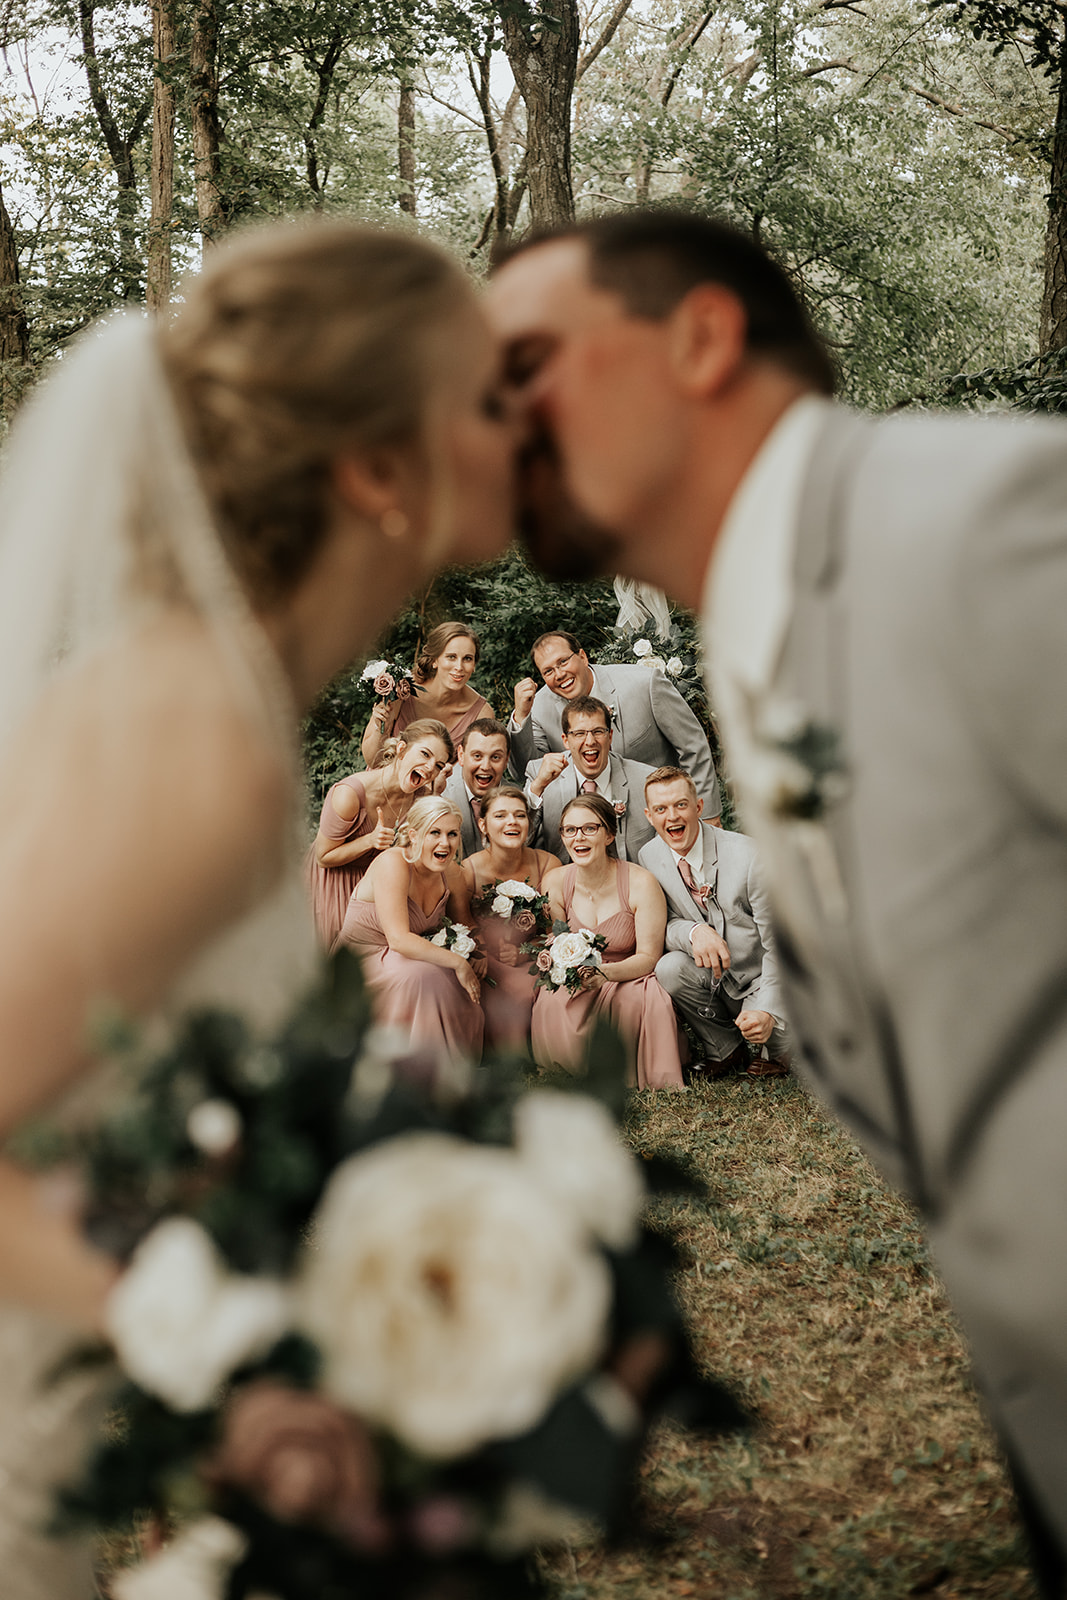 wedding party sneak shot